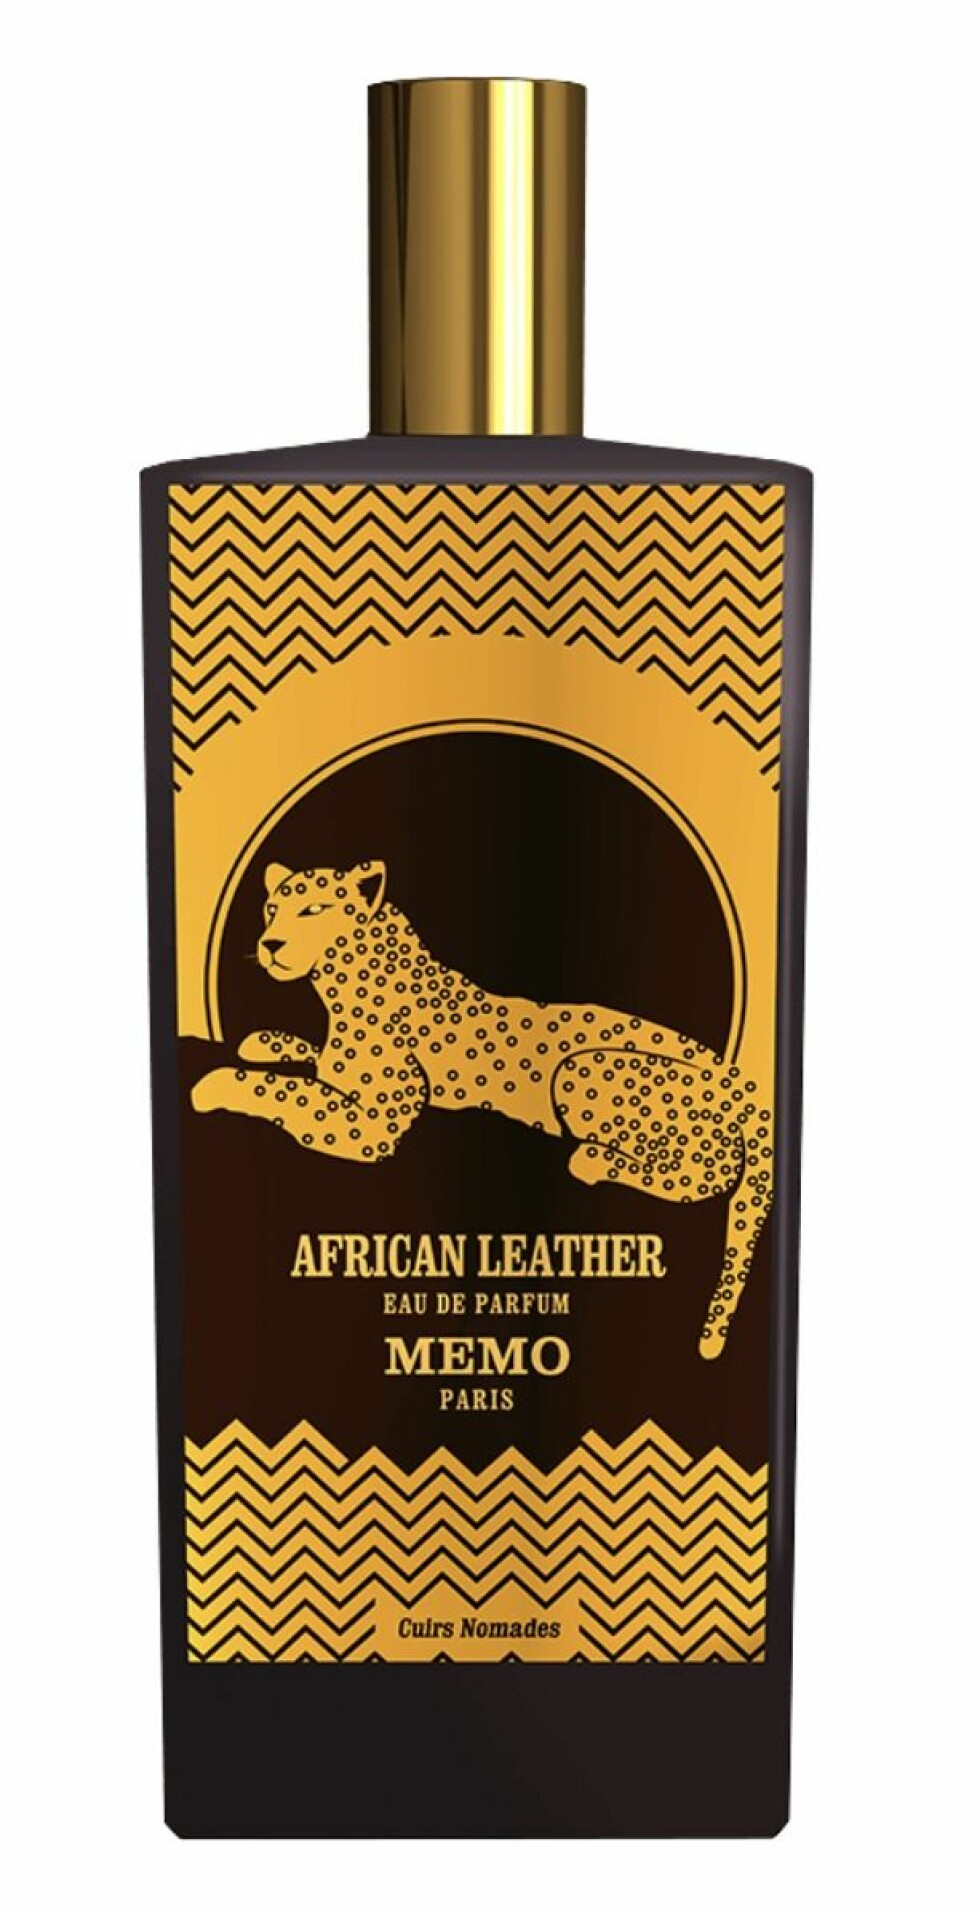 Lærakkorder, musk og krydderoljer som hinter deg til den afrikanske savannen (kr 2500, Memo Paris, African Leather).